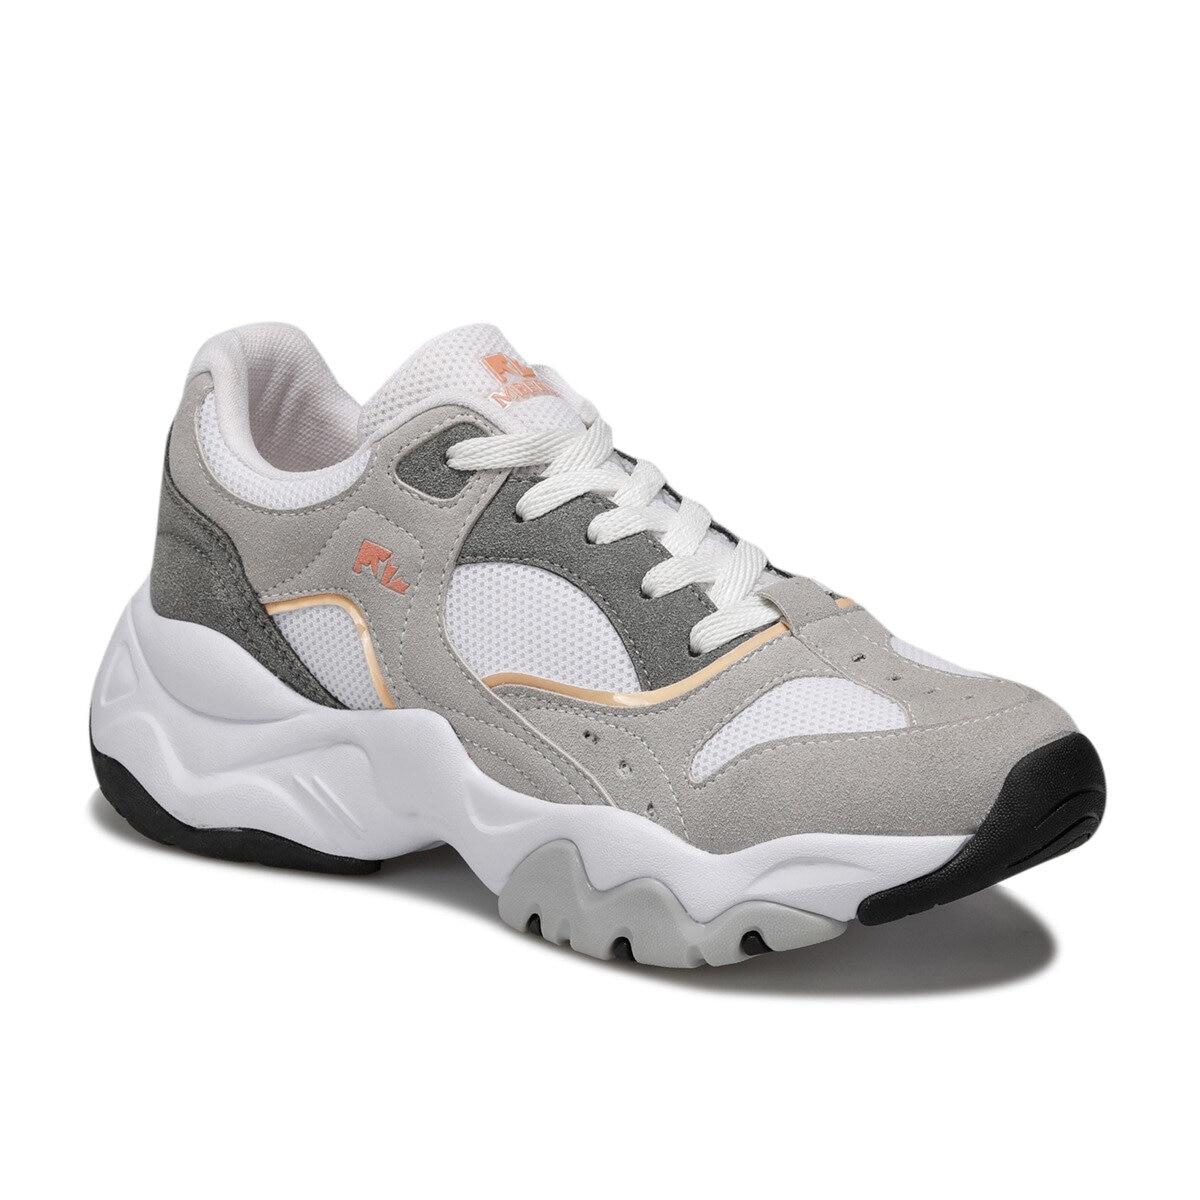 FLO REGINA White Women 'S Sneaker Shoes LUMBERJACK Hiking Shoes     - title=